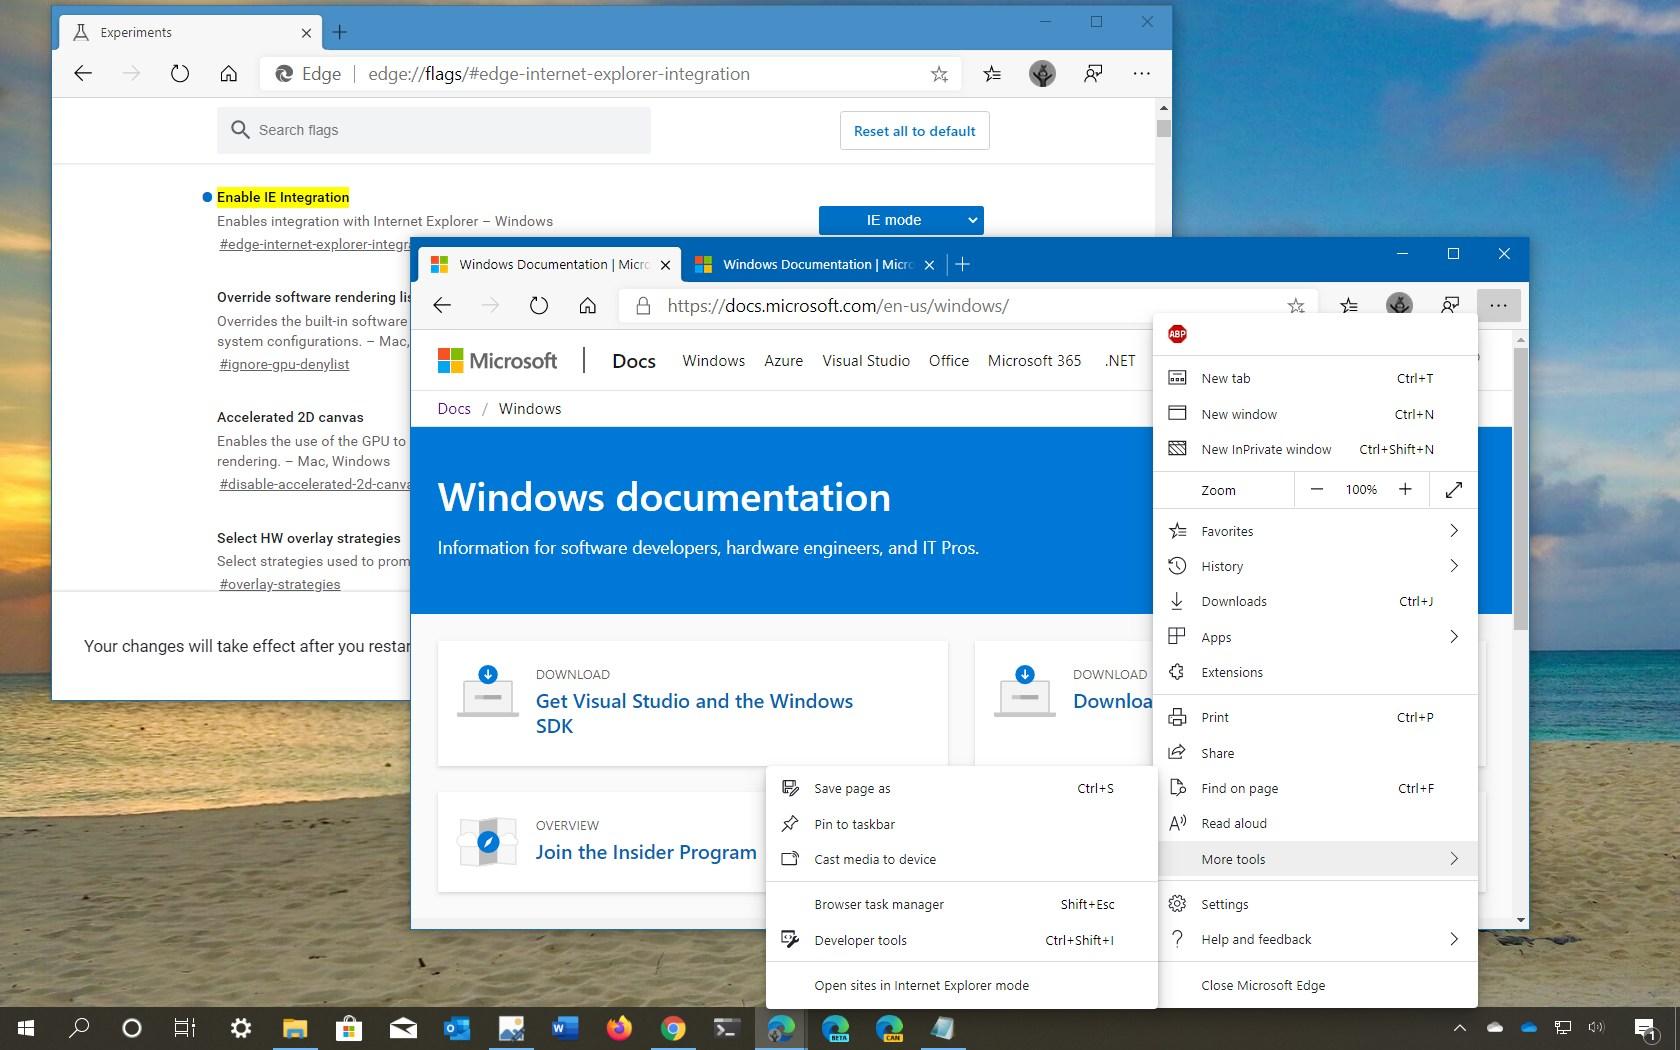 Microsoft Edge enable IE Mode